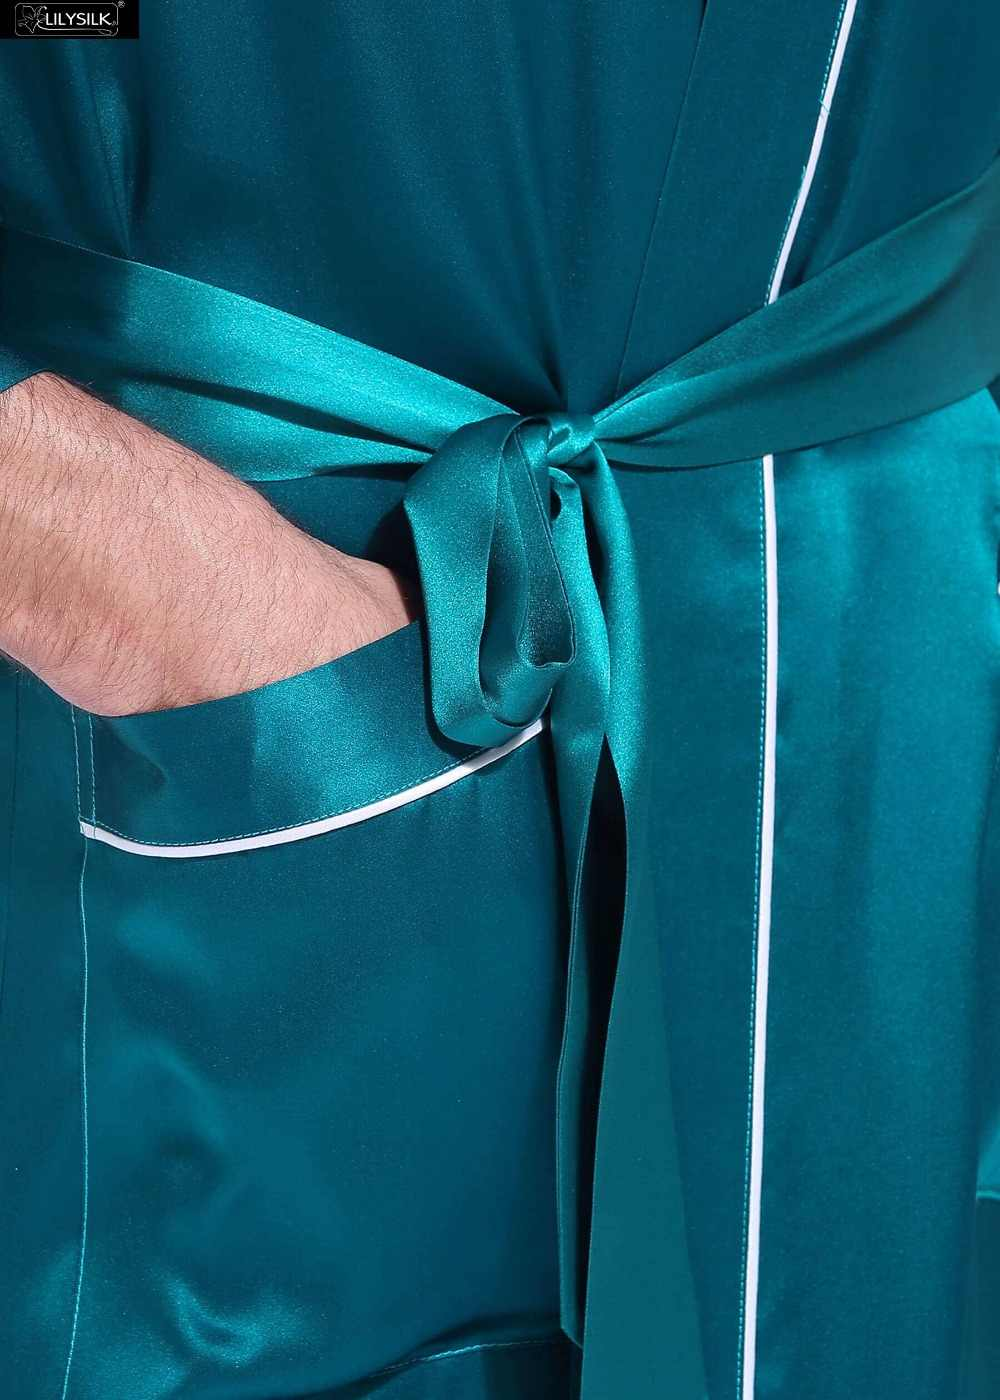 LilySilk ローブバスローブパジャマ着物男性正絹白 3 分袖ポケットクリアランス販売送料無料トリミング